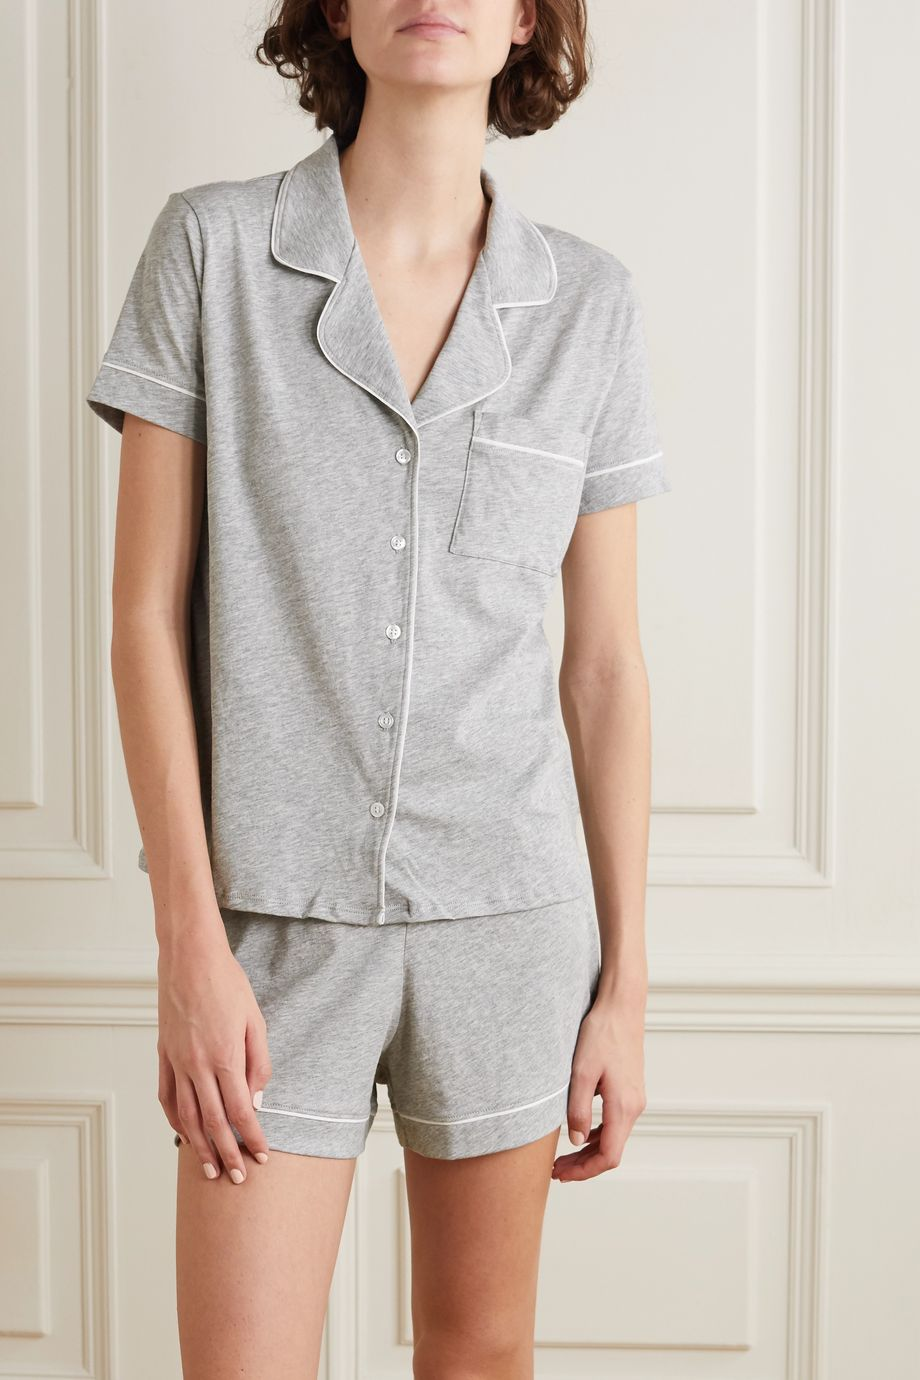 Skin Pyjama aus meliertem Bio-Pima-Baumwoll-Jersey mit Paspeln